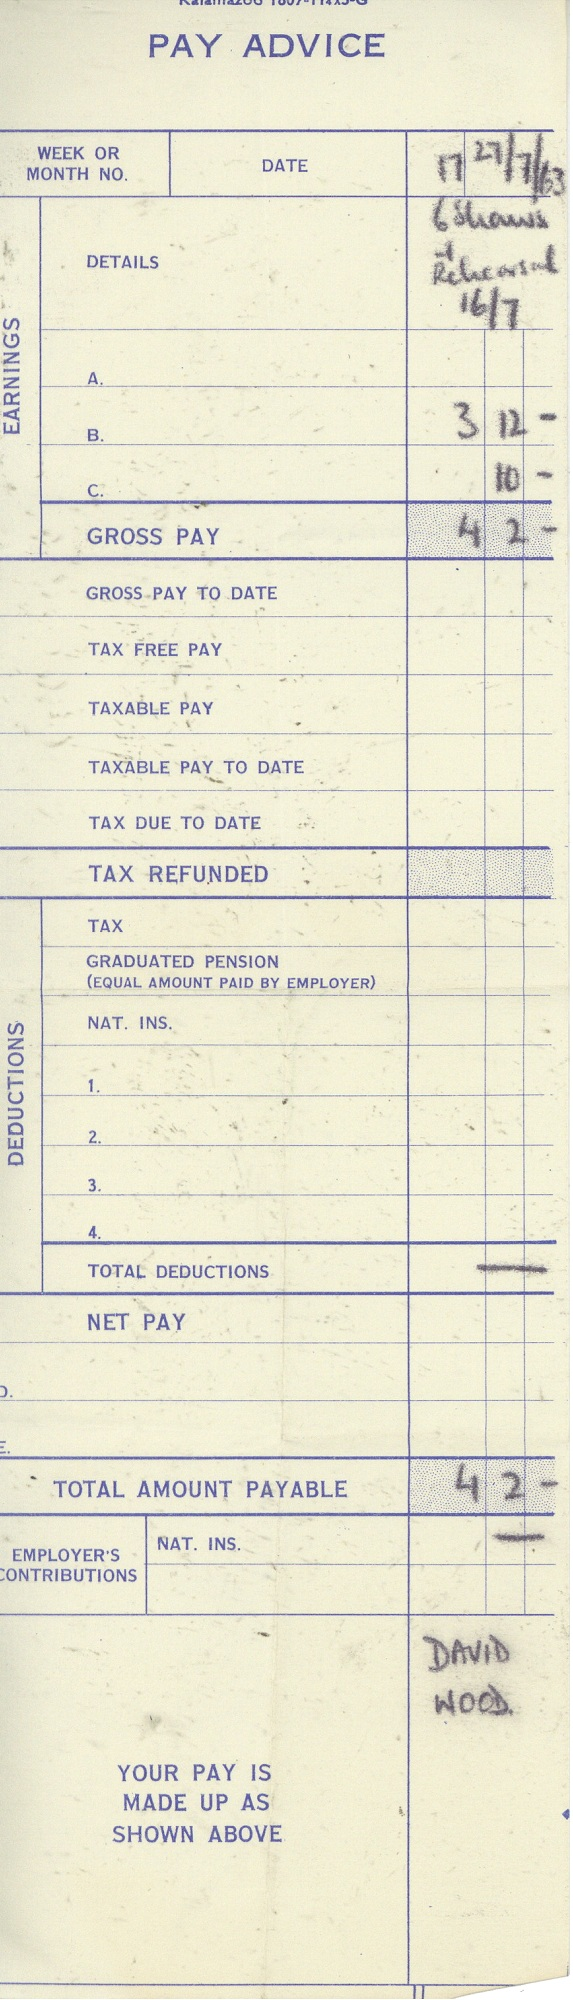 Pay slip - Saint Joan, Workhouse Donke, David Wood - 27 Jul 1963